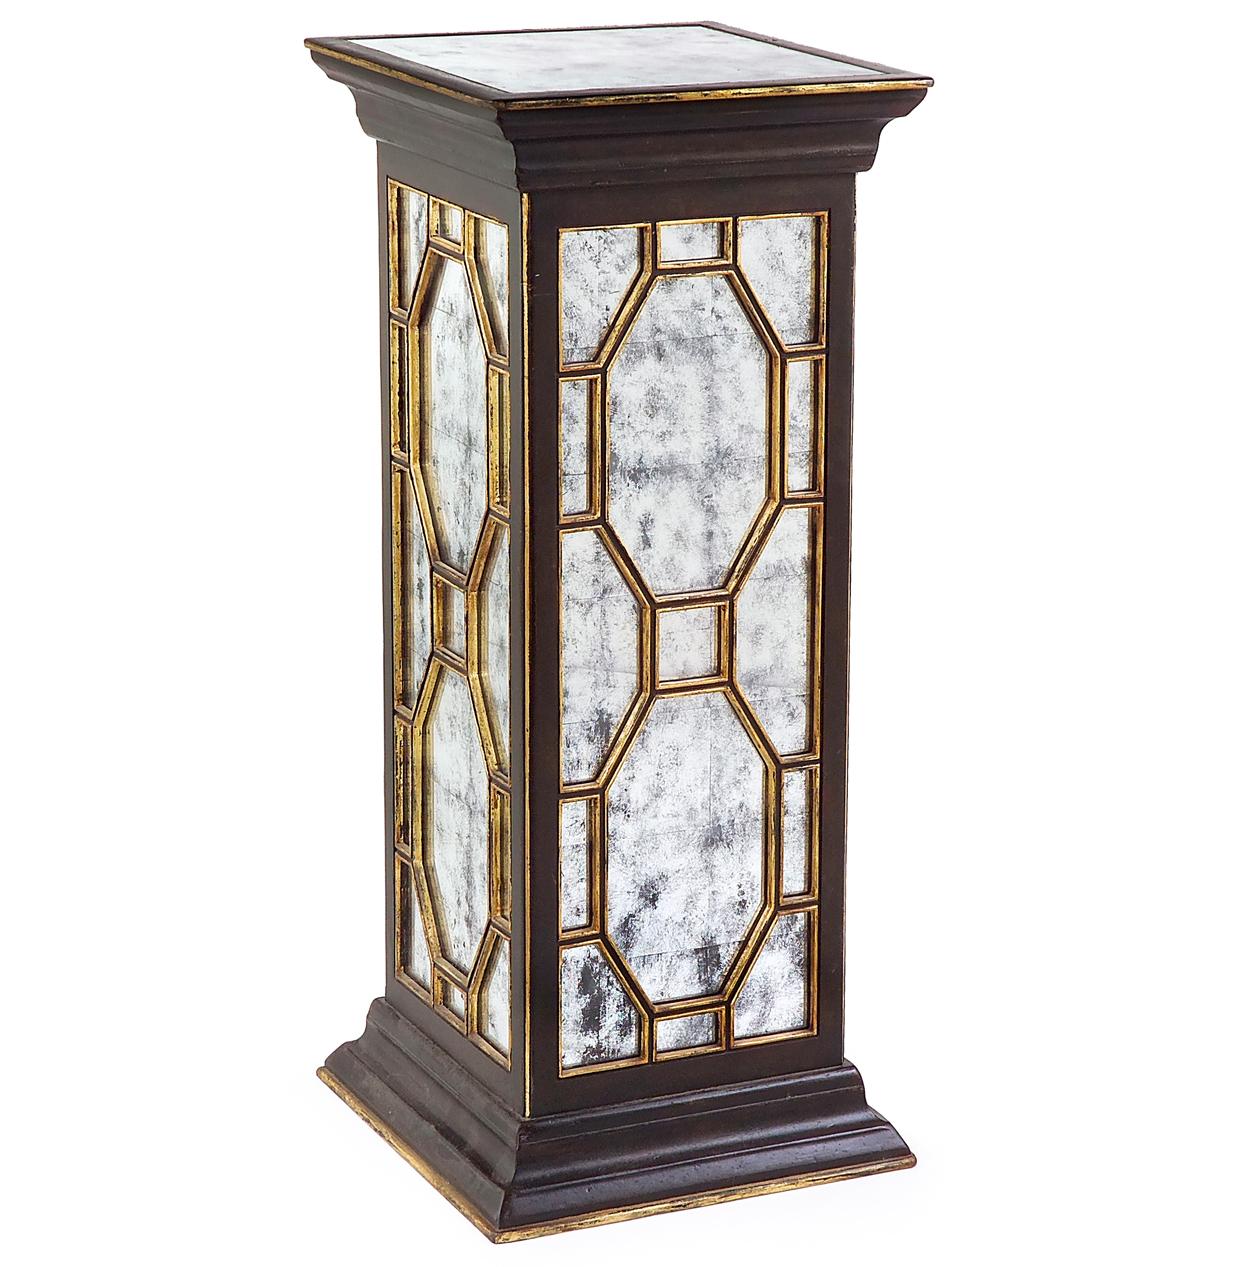 Cadence Traditional Hollywood Black Silver Leaf Mirror Pedestal Table - 36 Inch